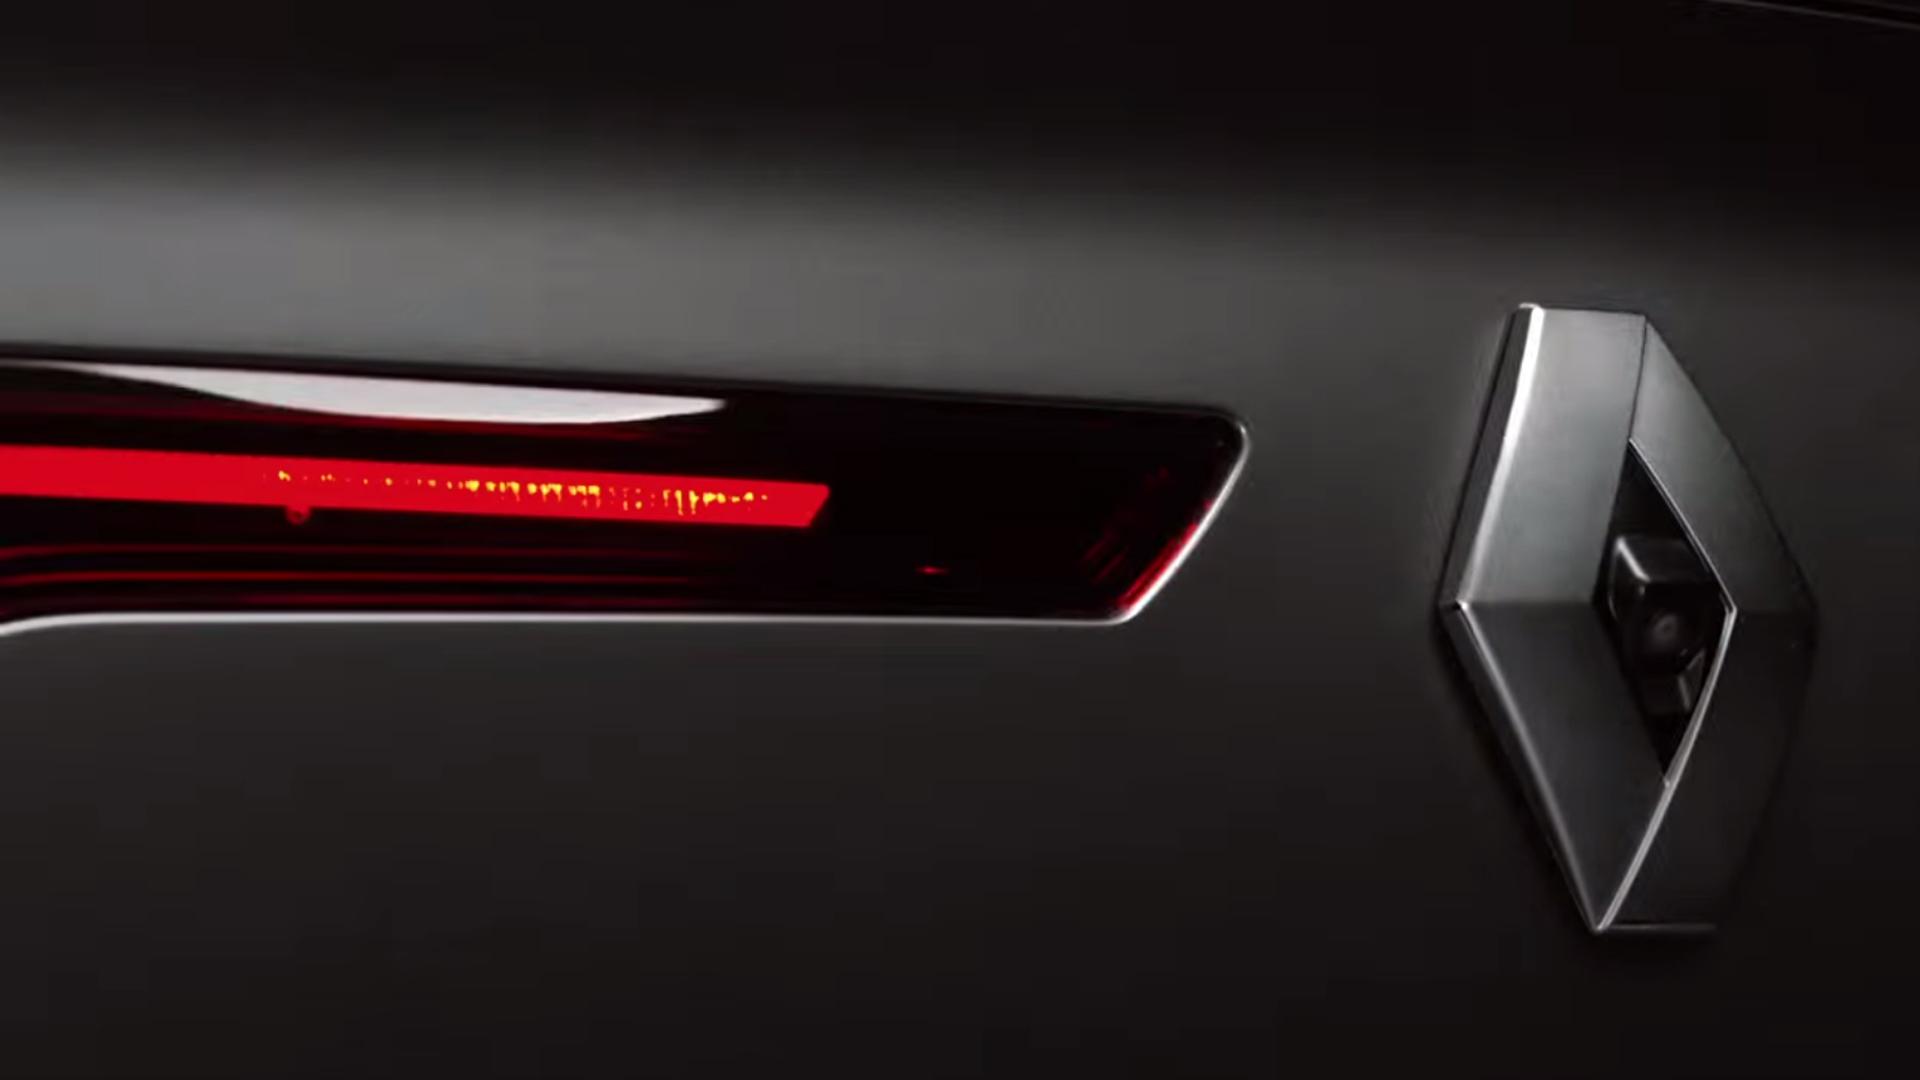 Renault Talisman - 2015 - teaser - arrière / rear